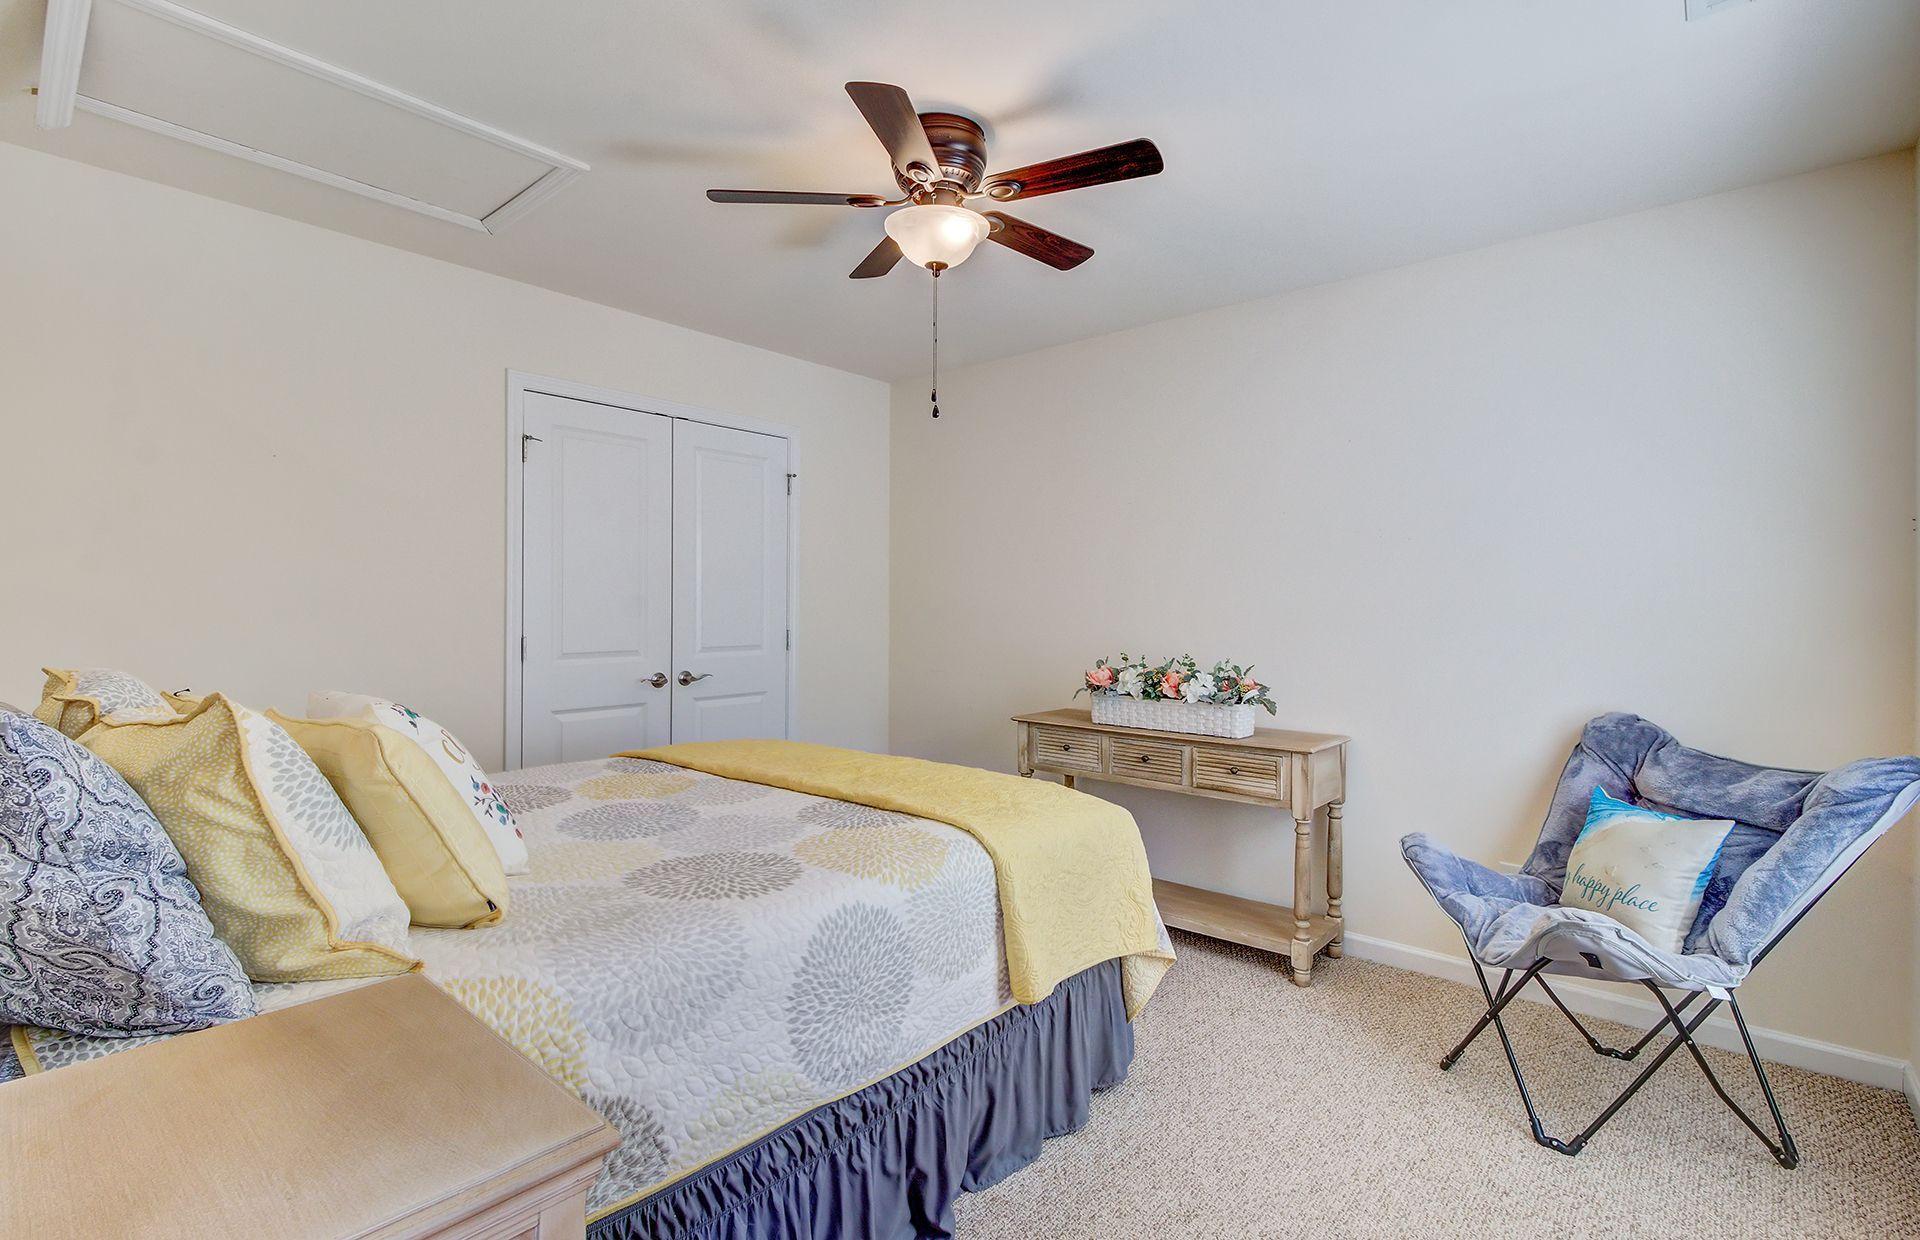 Linnen Place Homes For Sale - 1275 Shingleback, Mount Pleasant, SC - 14